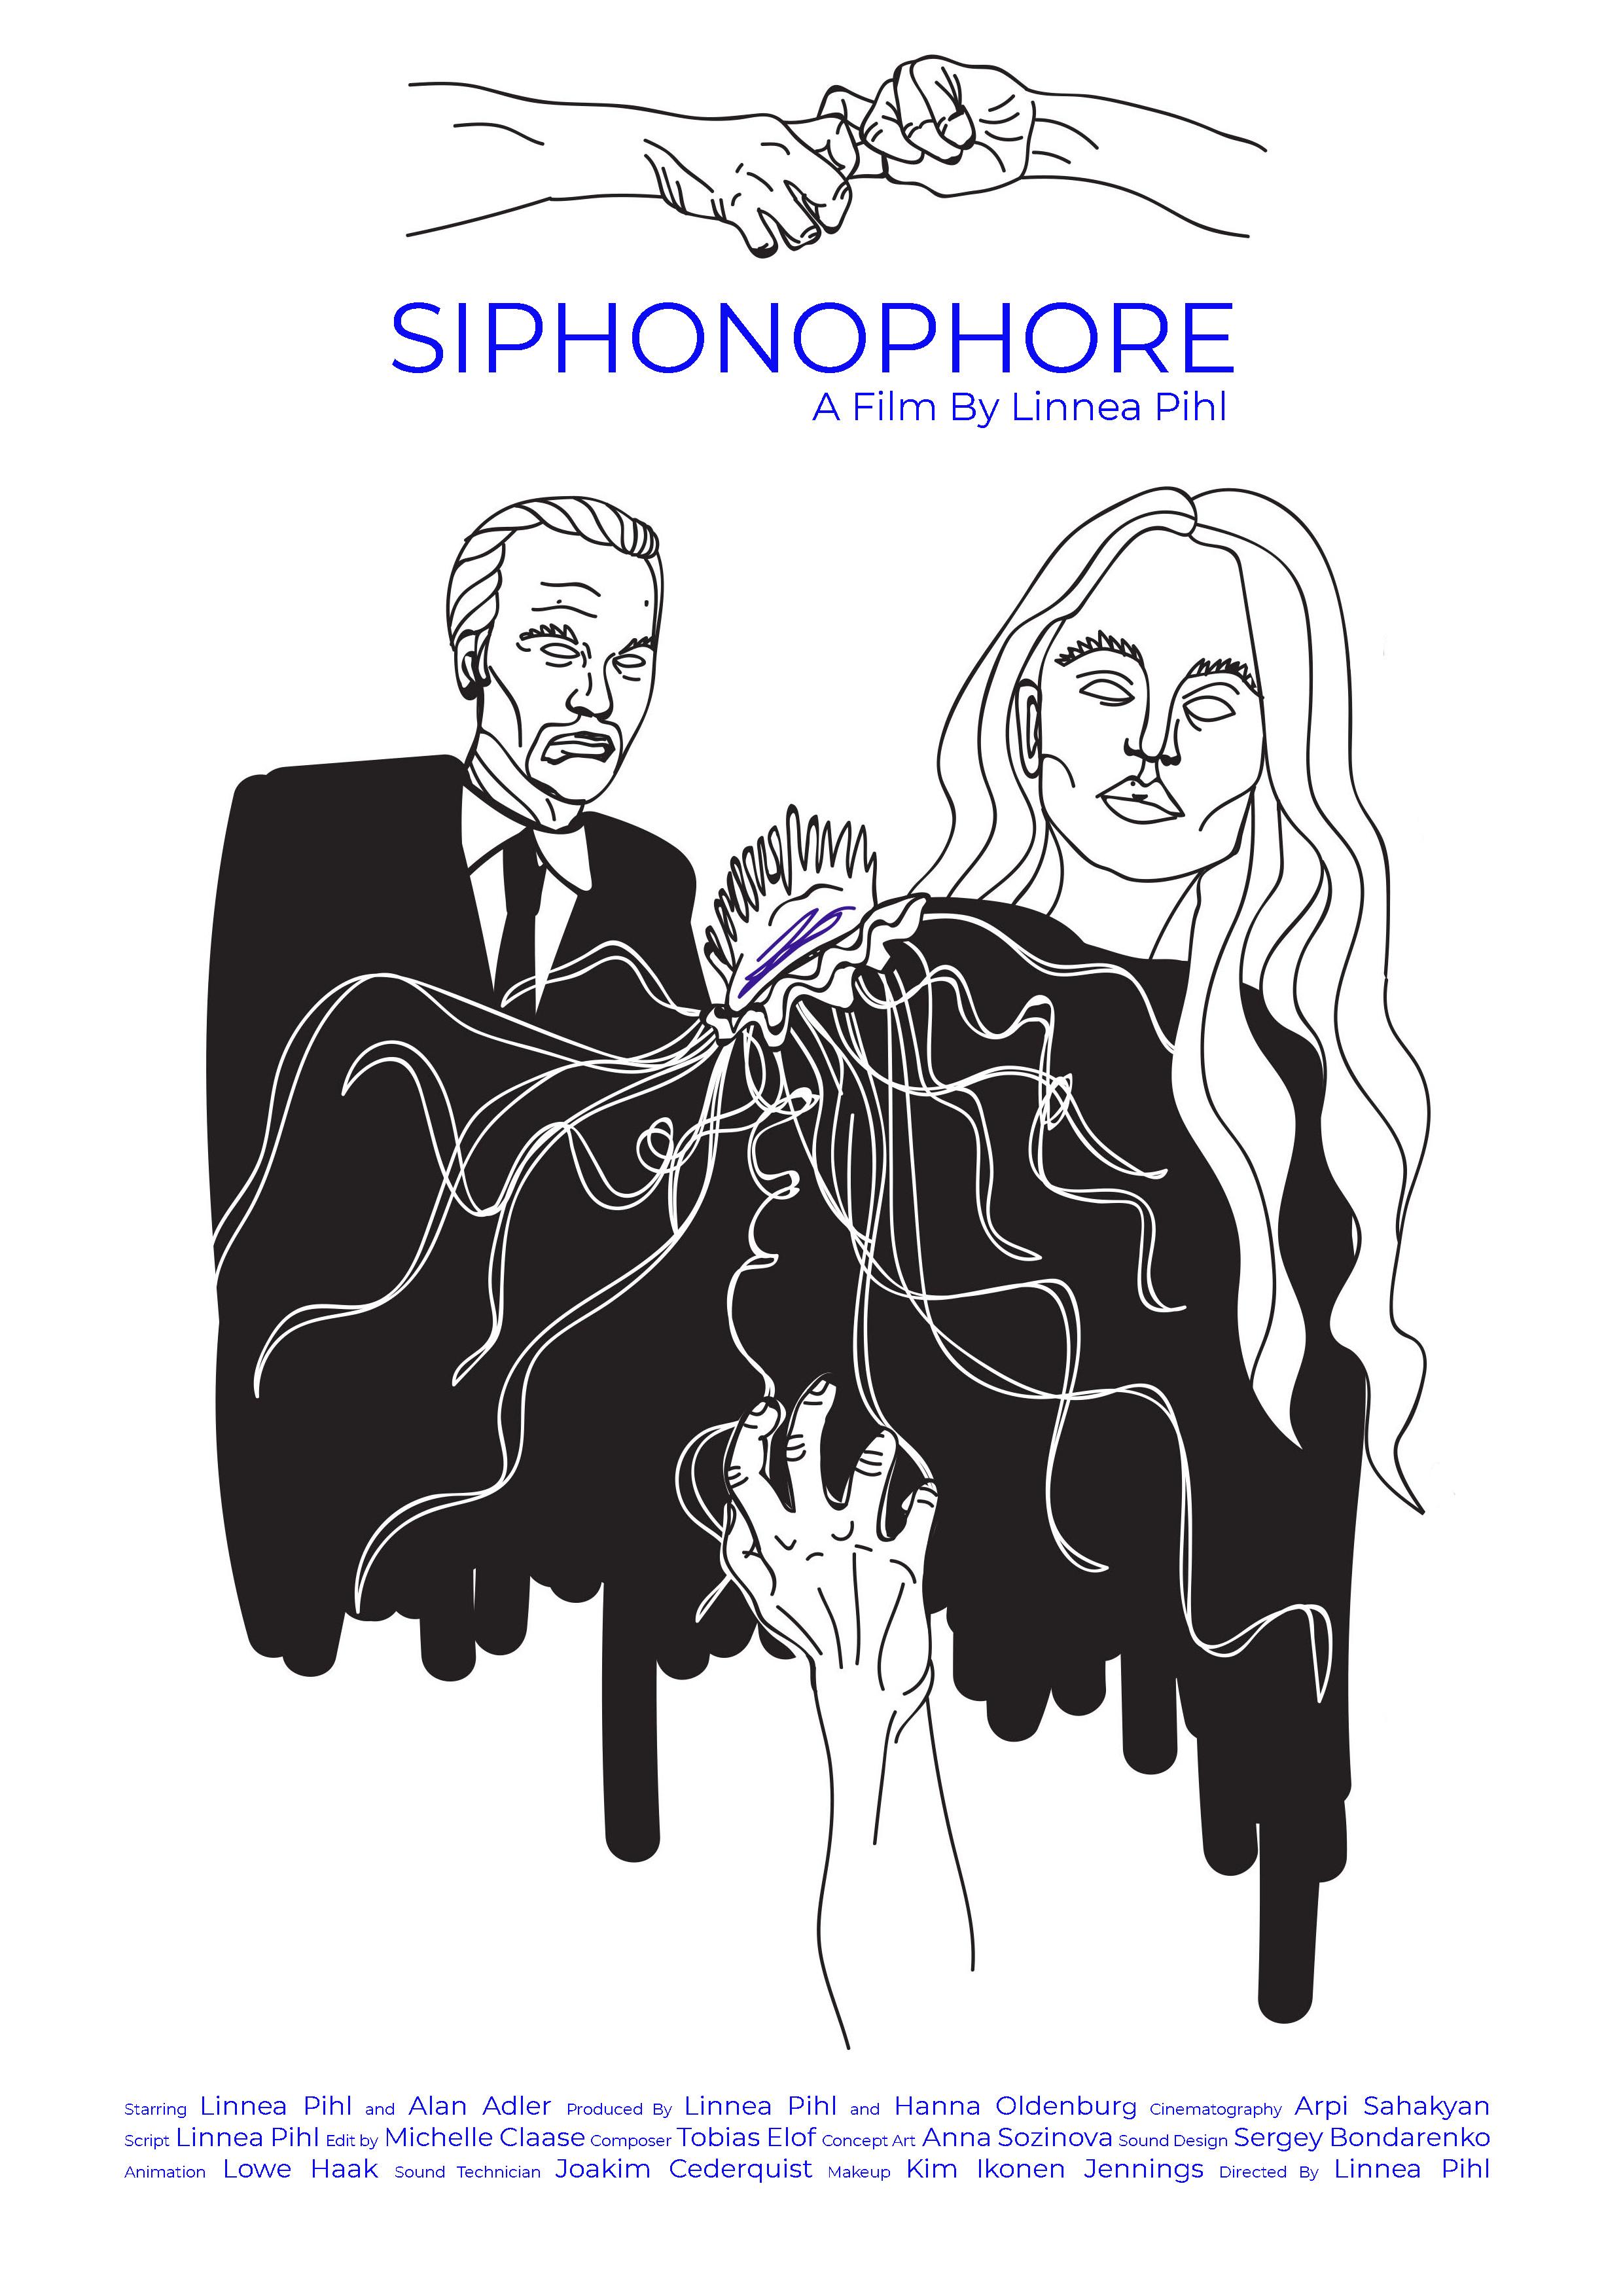 SiphonophoreFilmPoster.jpg